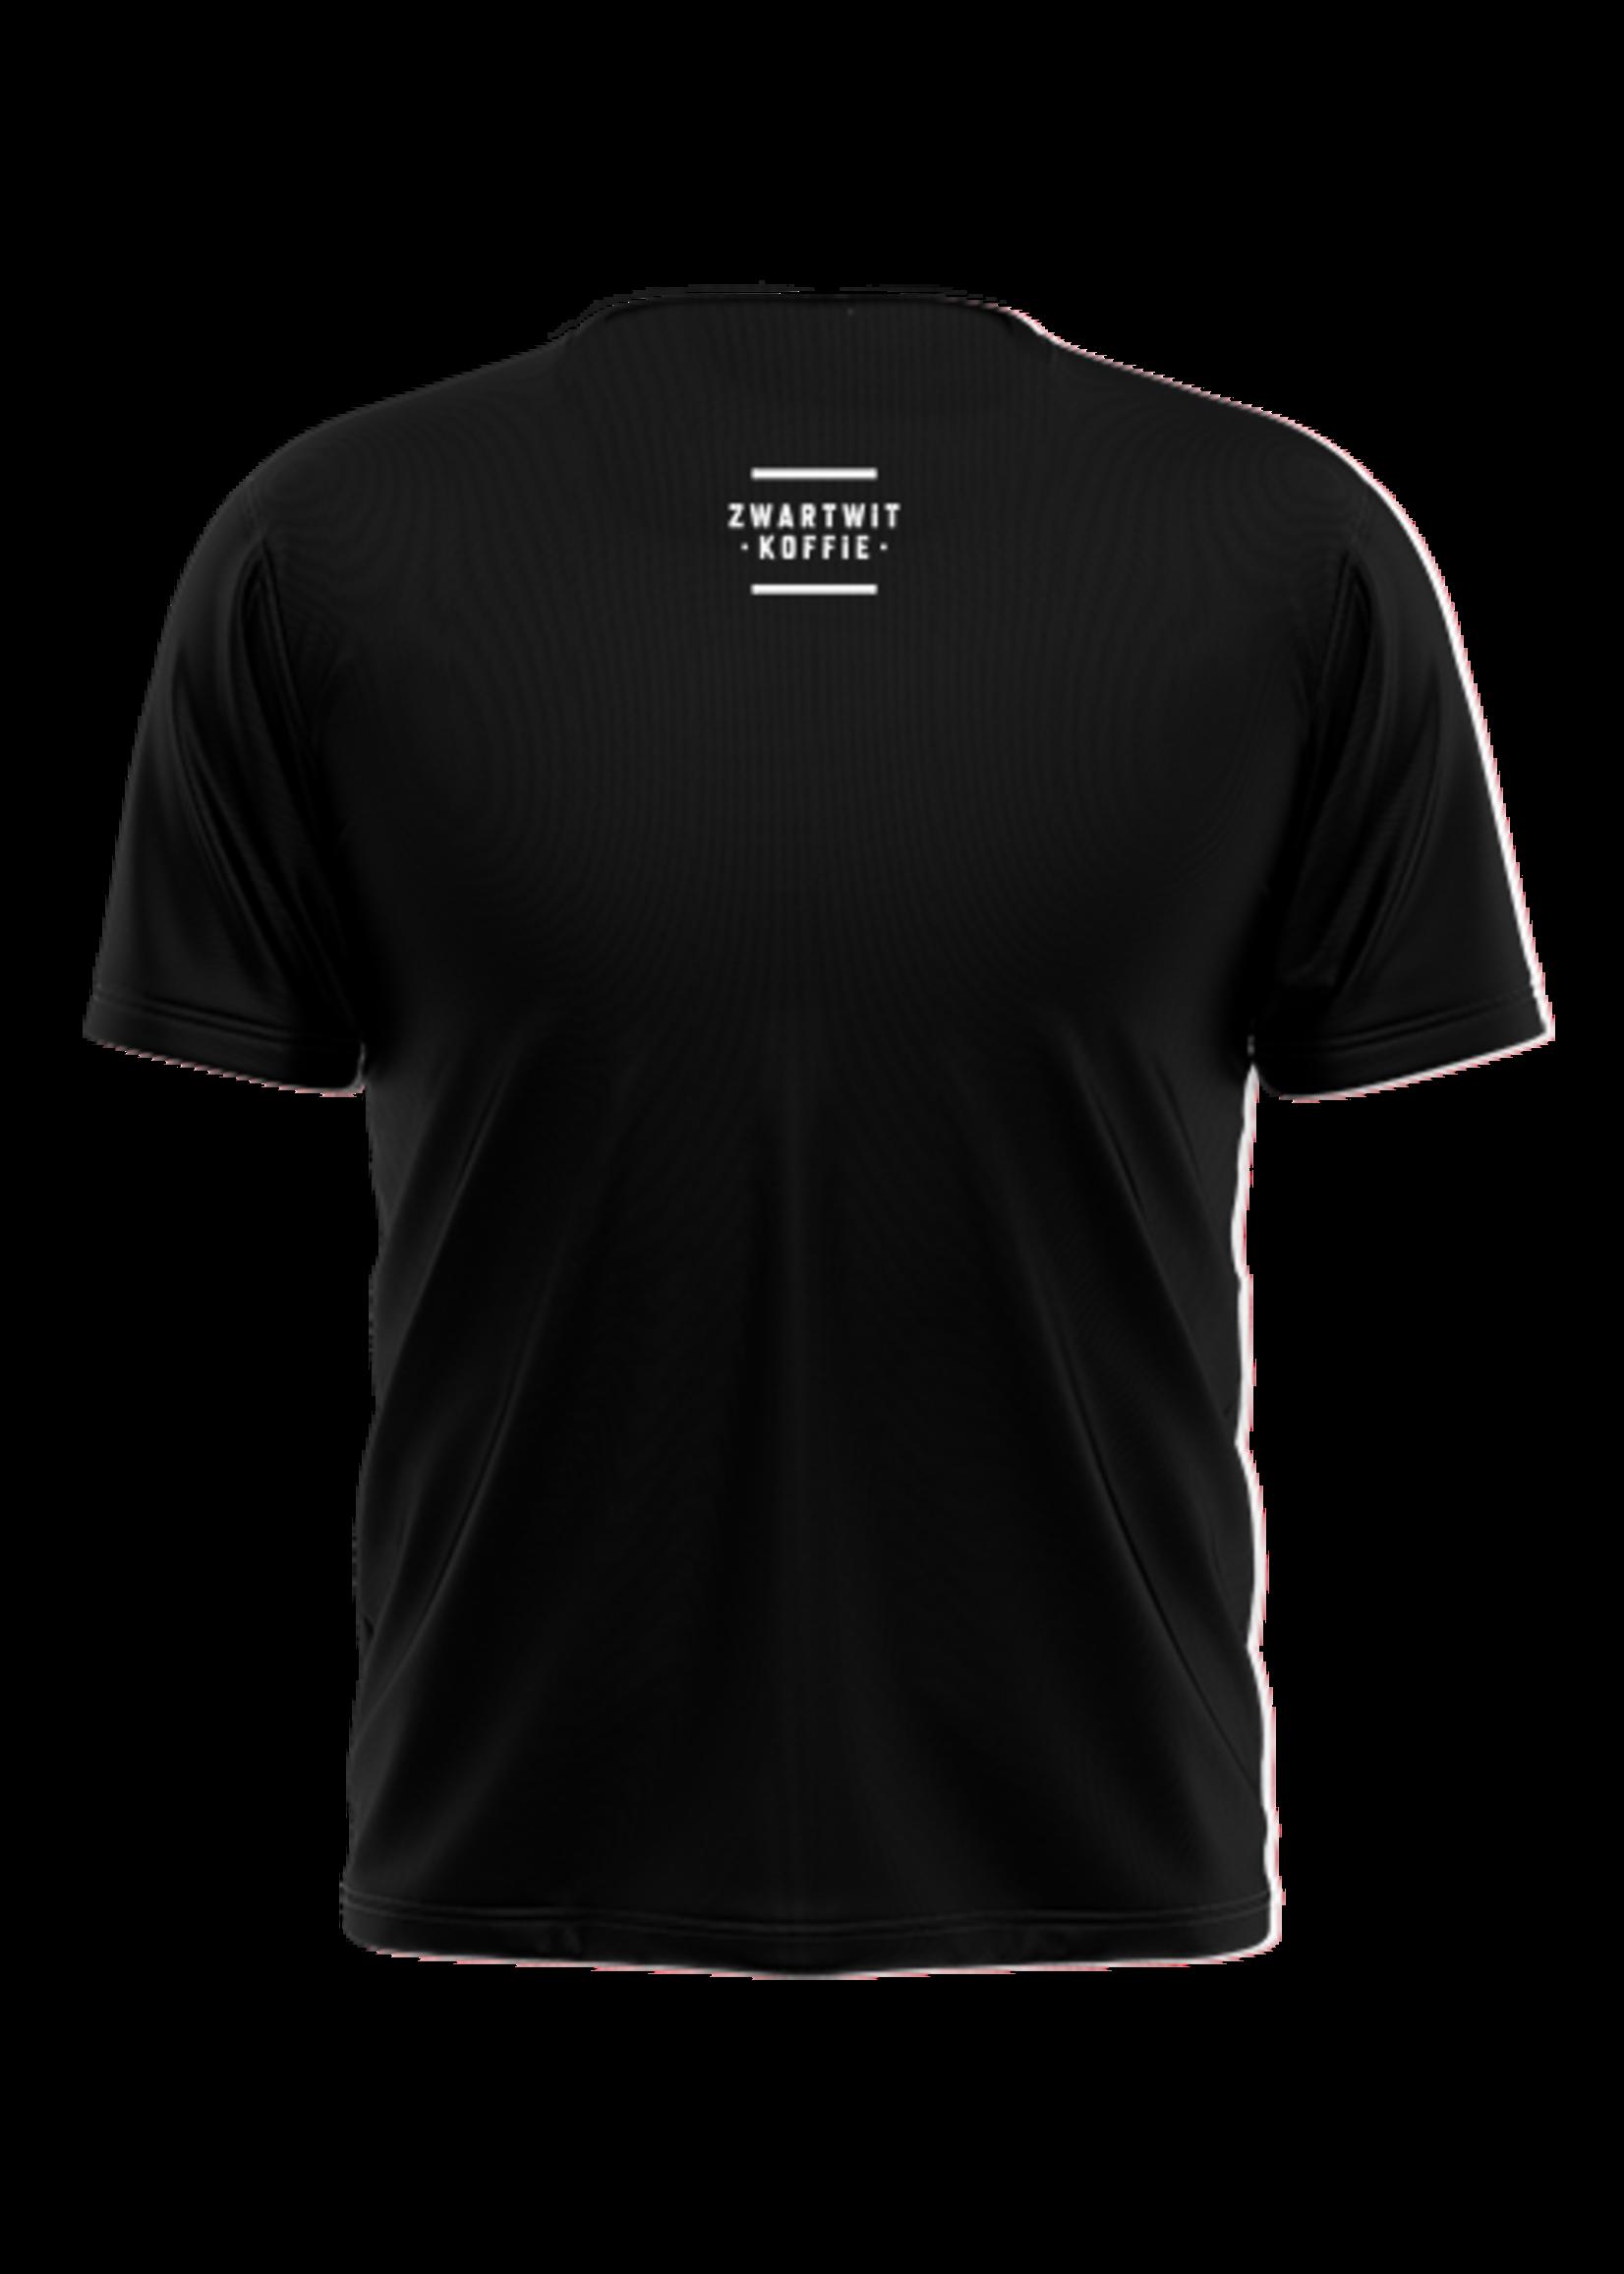 Rebel & Dutch ZwartWit T-shirt black black